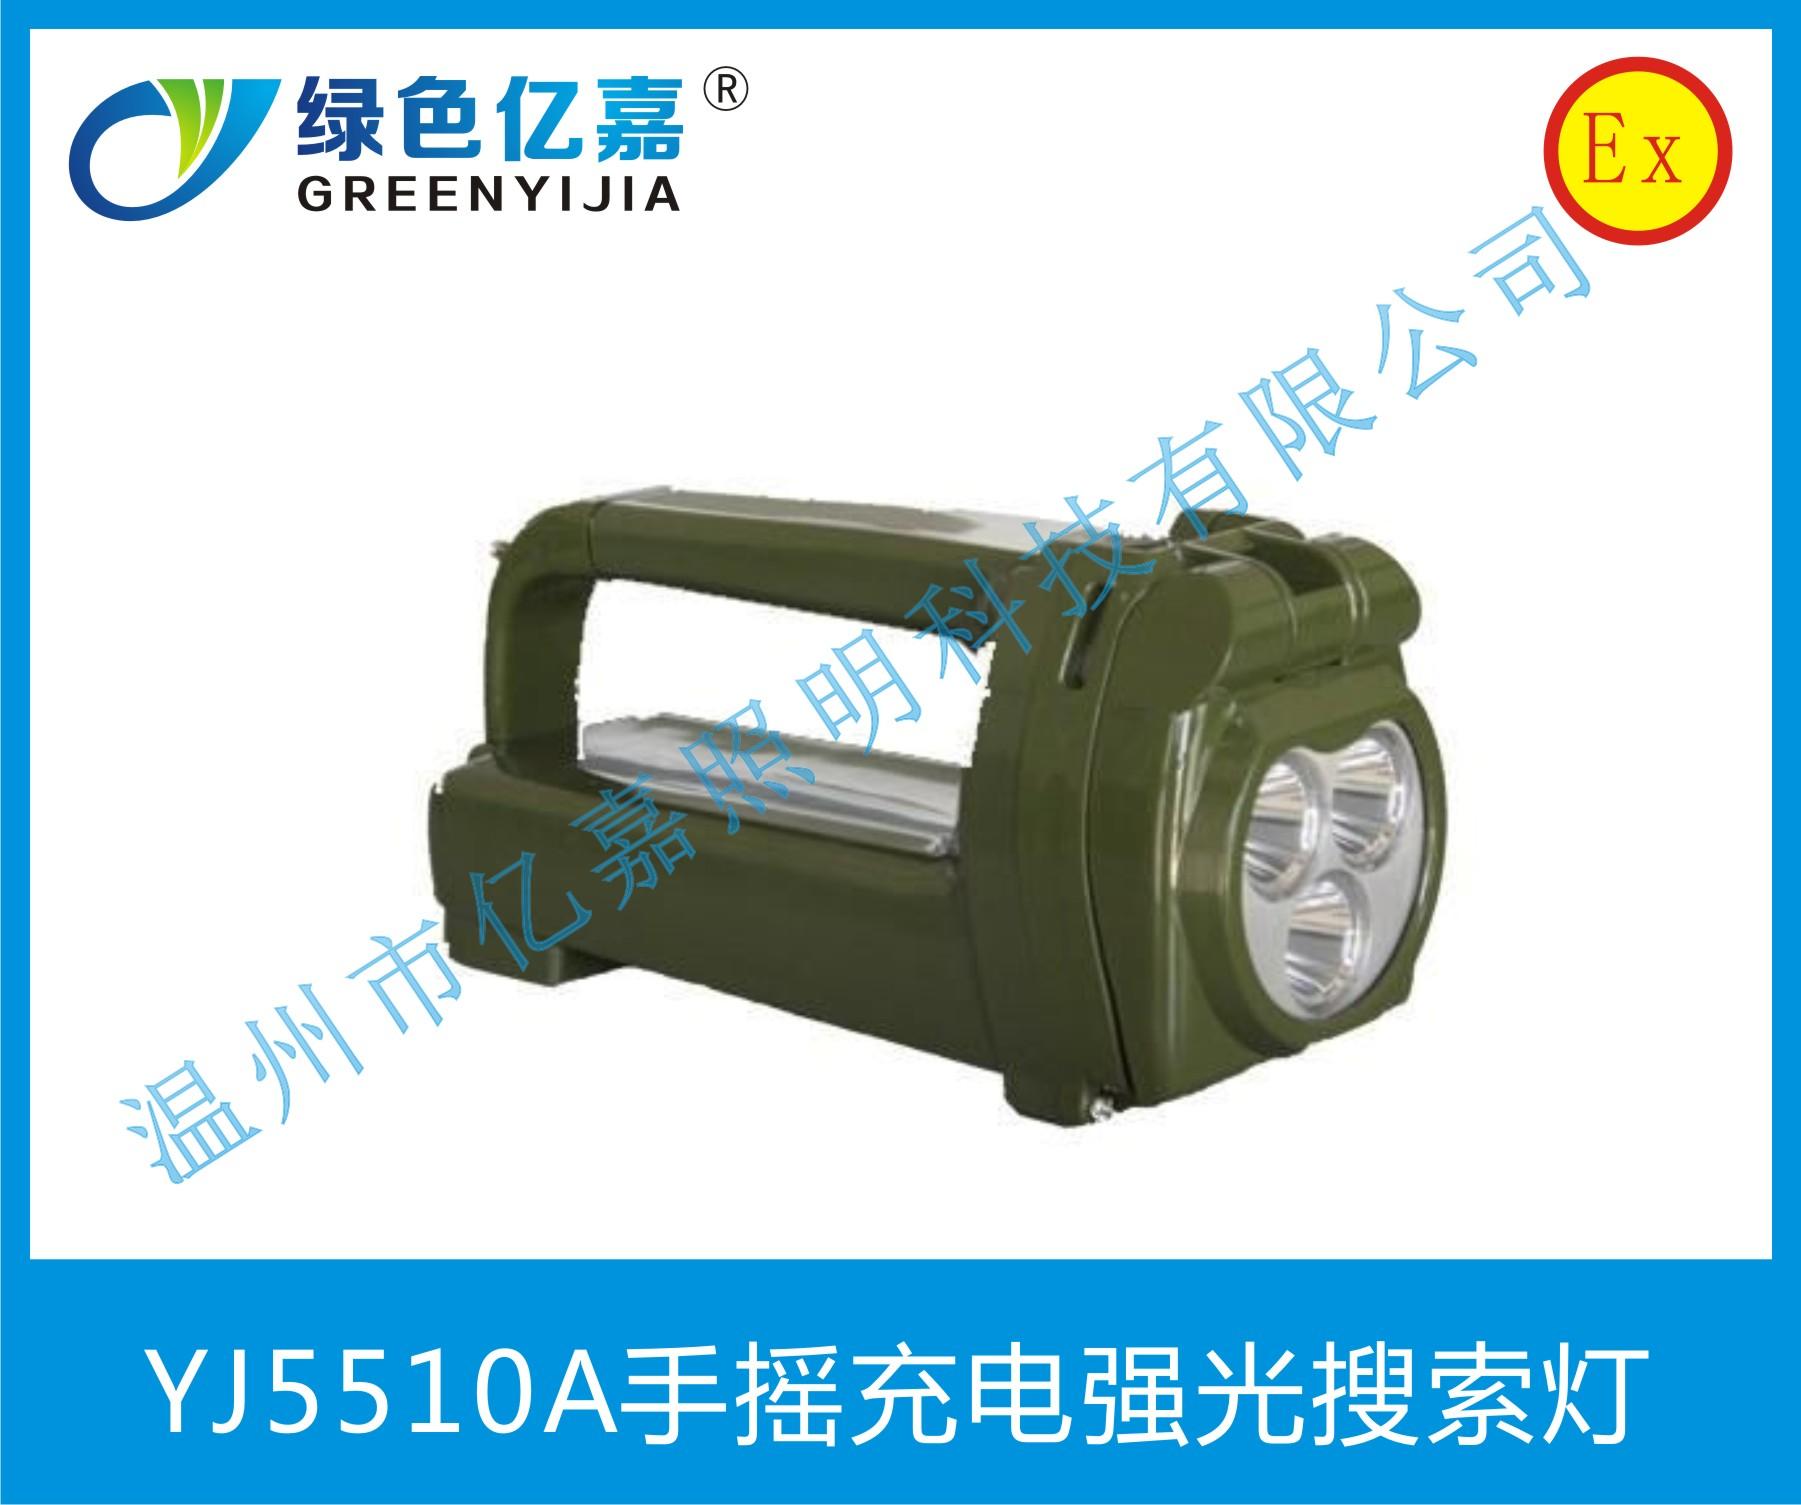 YJ5510A手摇充电强光搜索灯